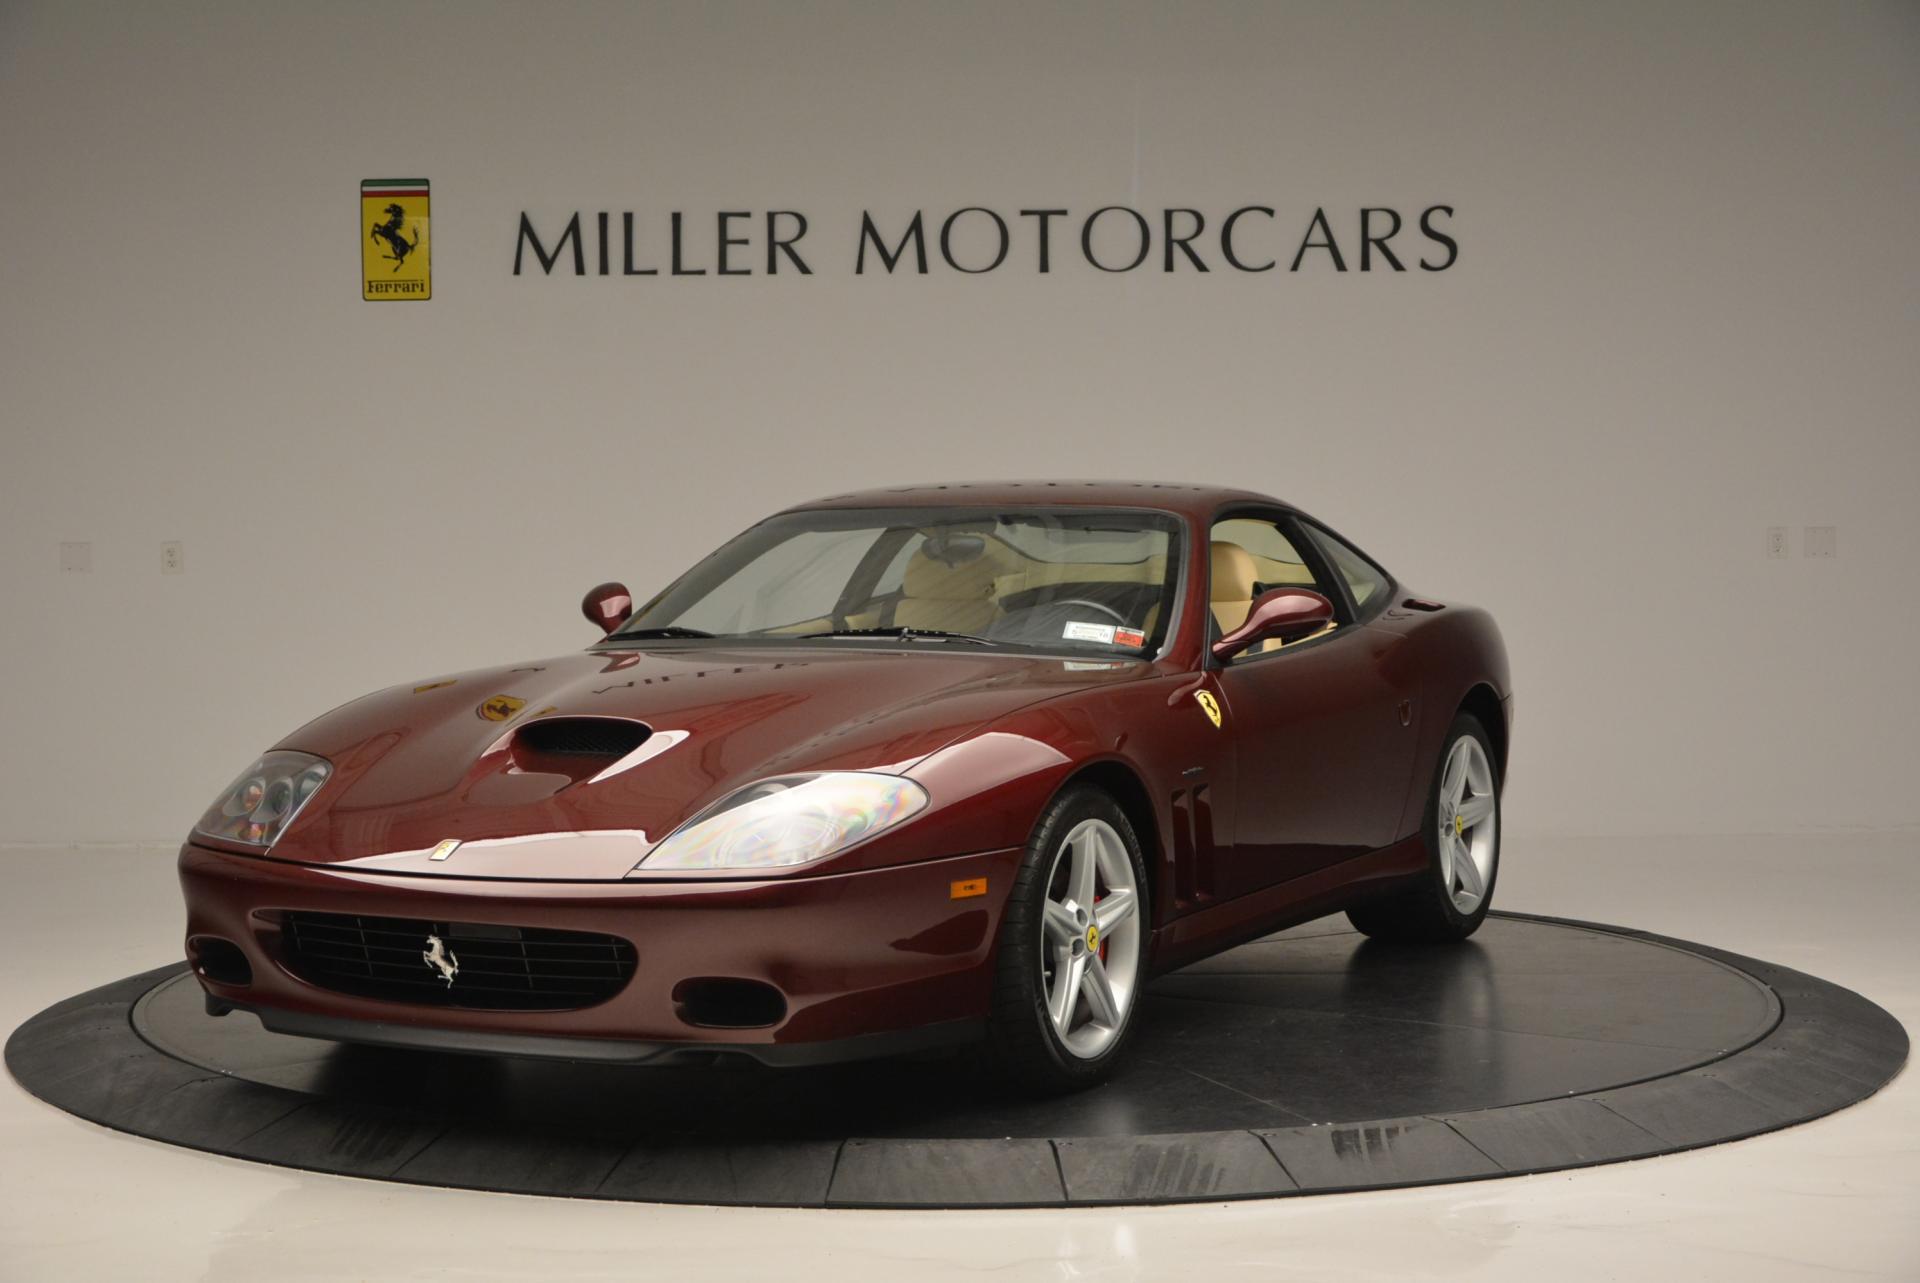 Used 2003 Ferrari 575M Maranello 6-Speed Manual for sale Sold at Alfa Romeo of Greenwich in Greenwich CT 06830 1